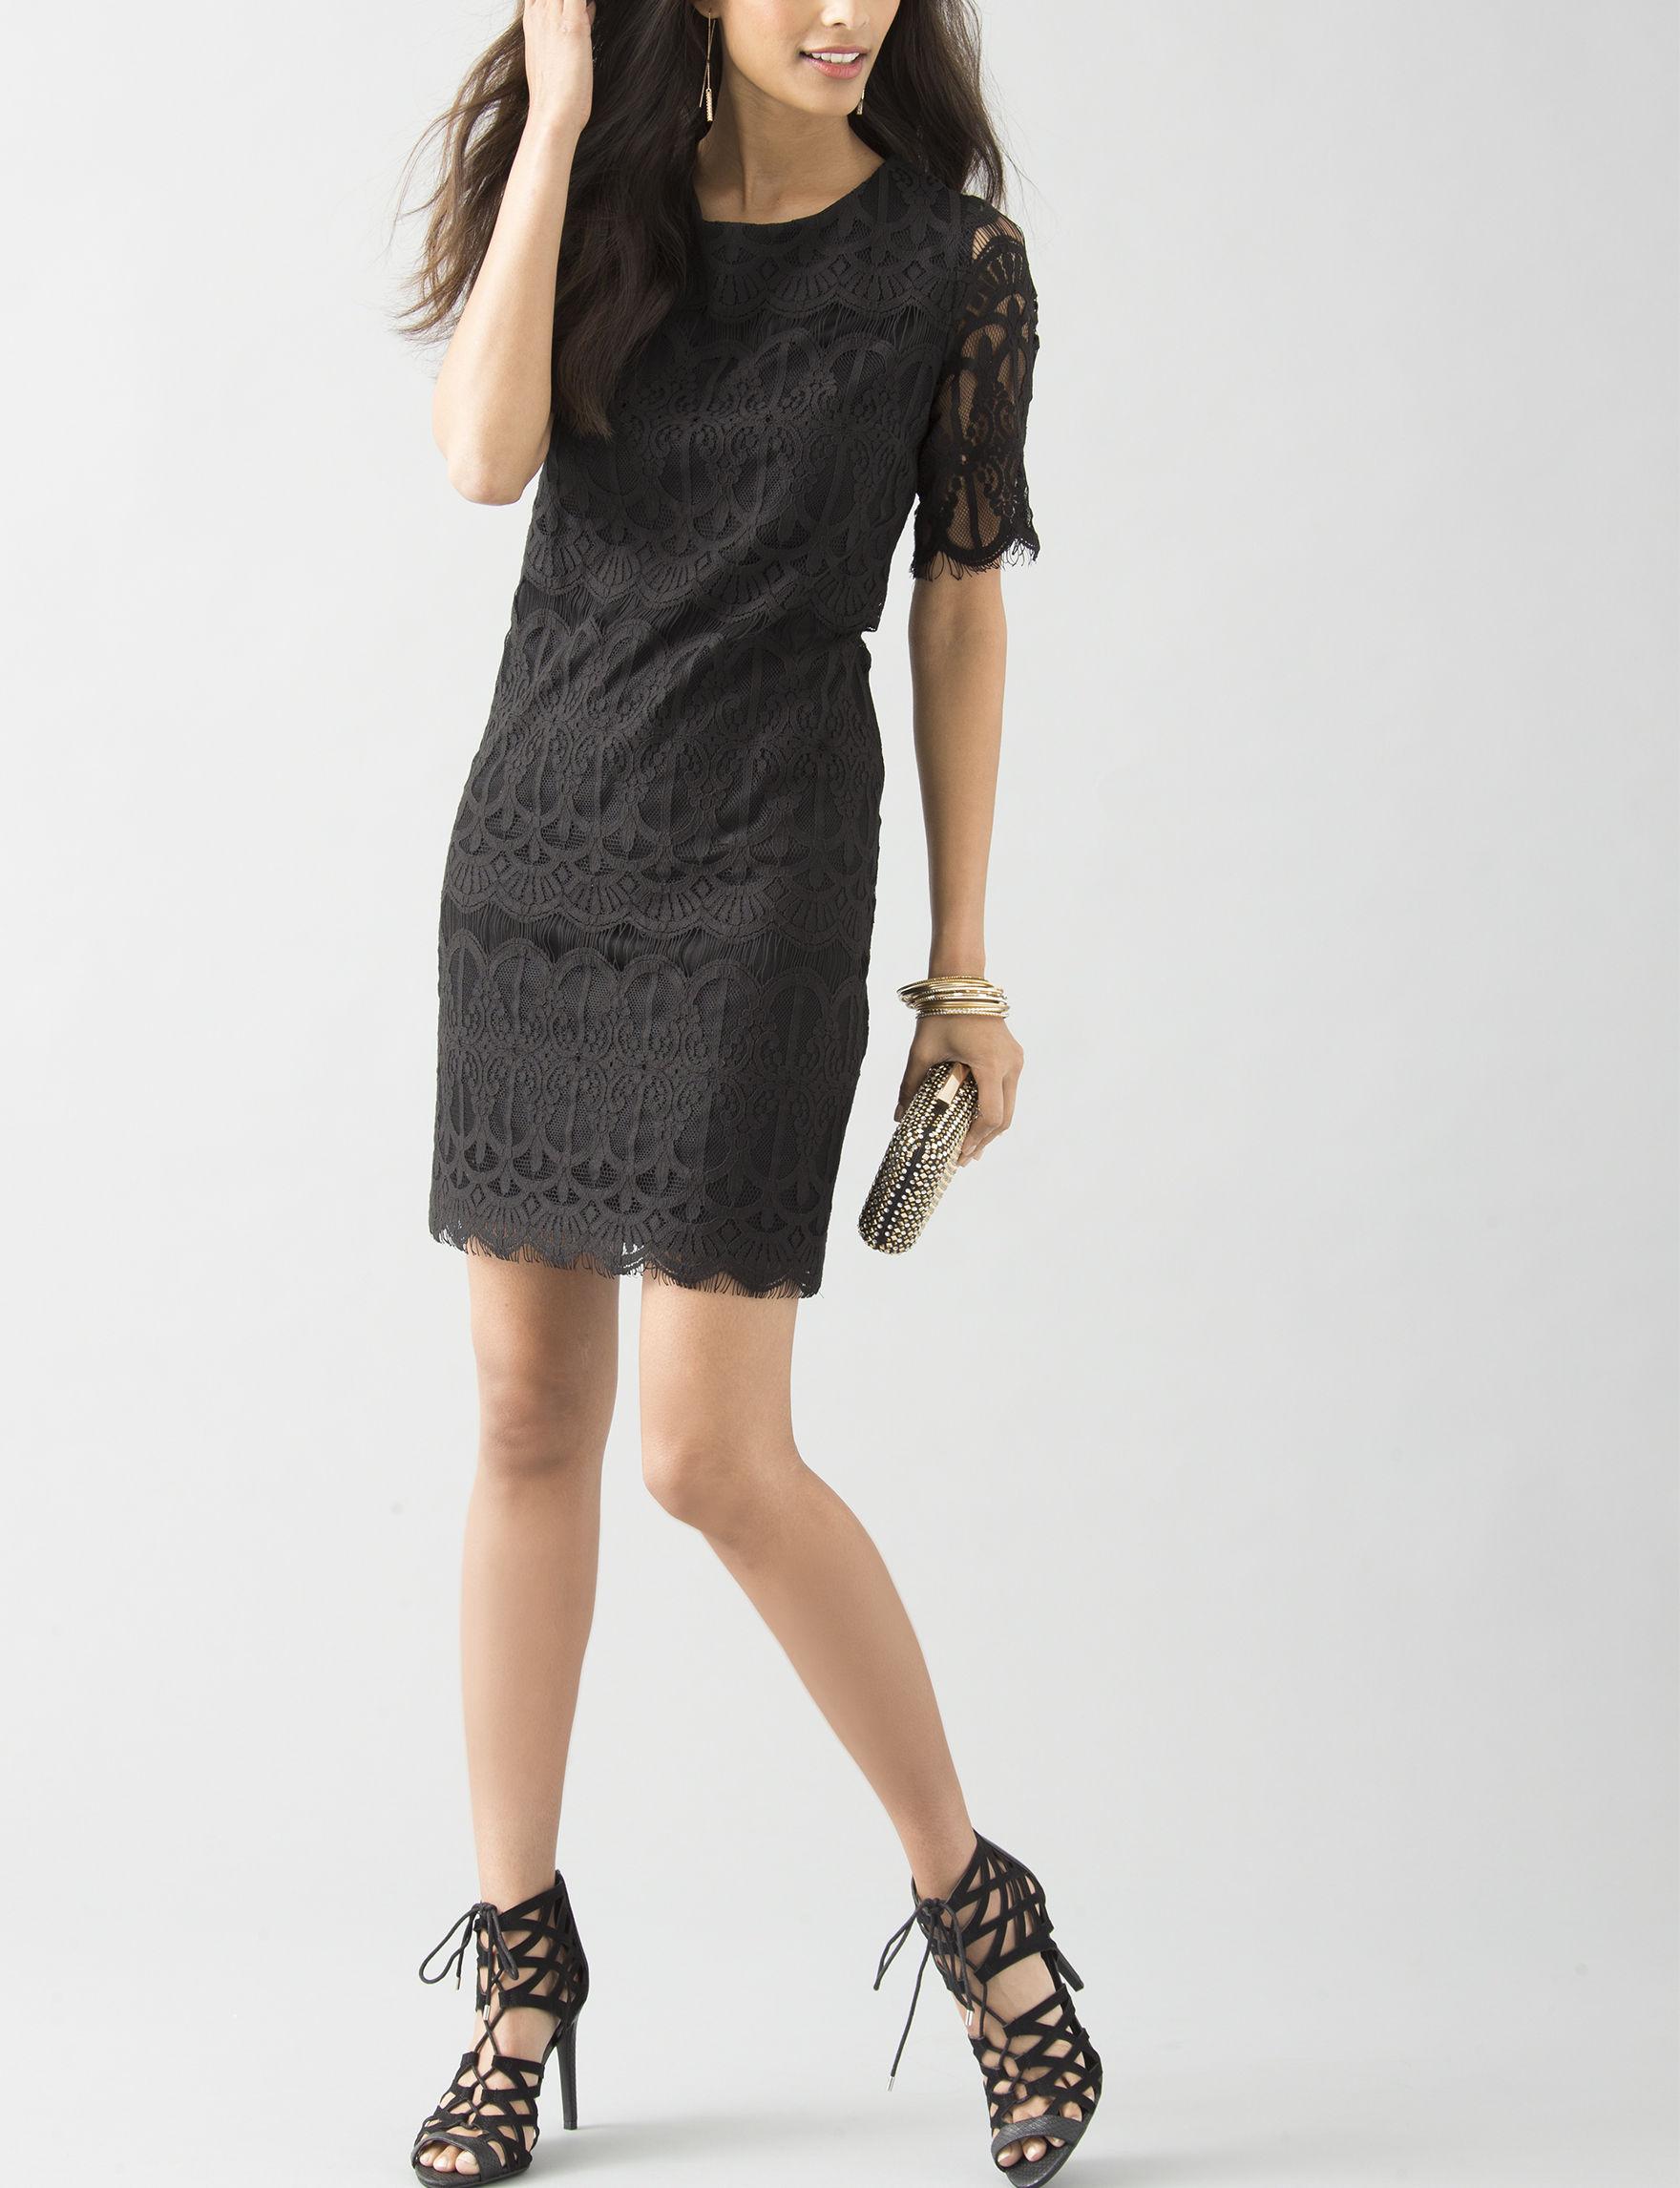 Ronni Nicole Black Sundresses